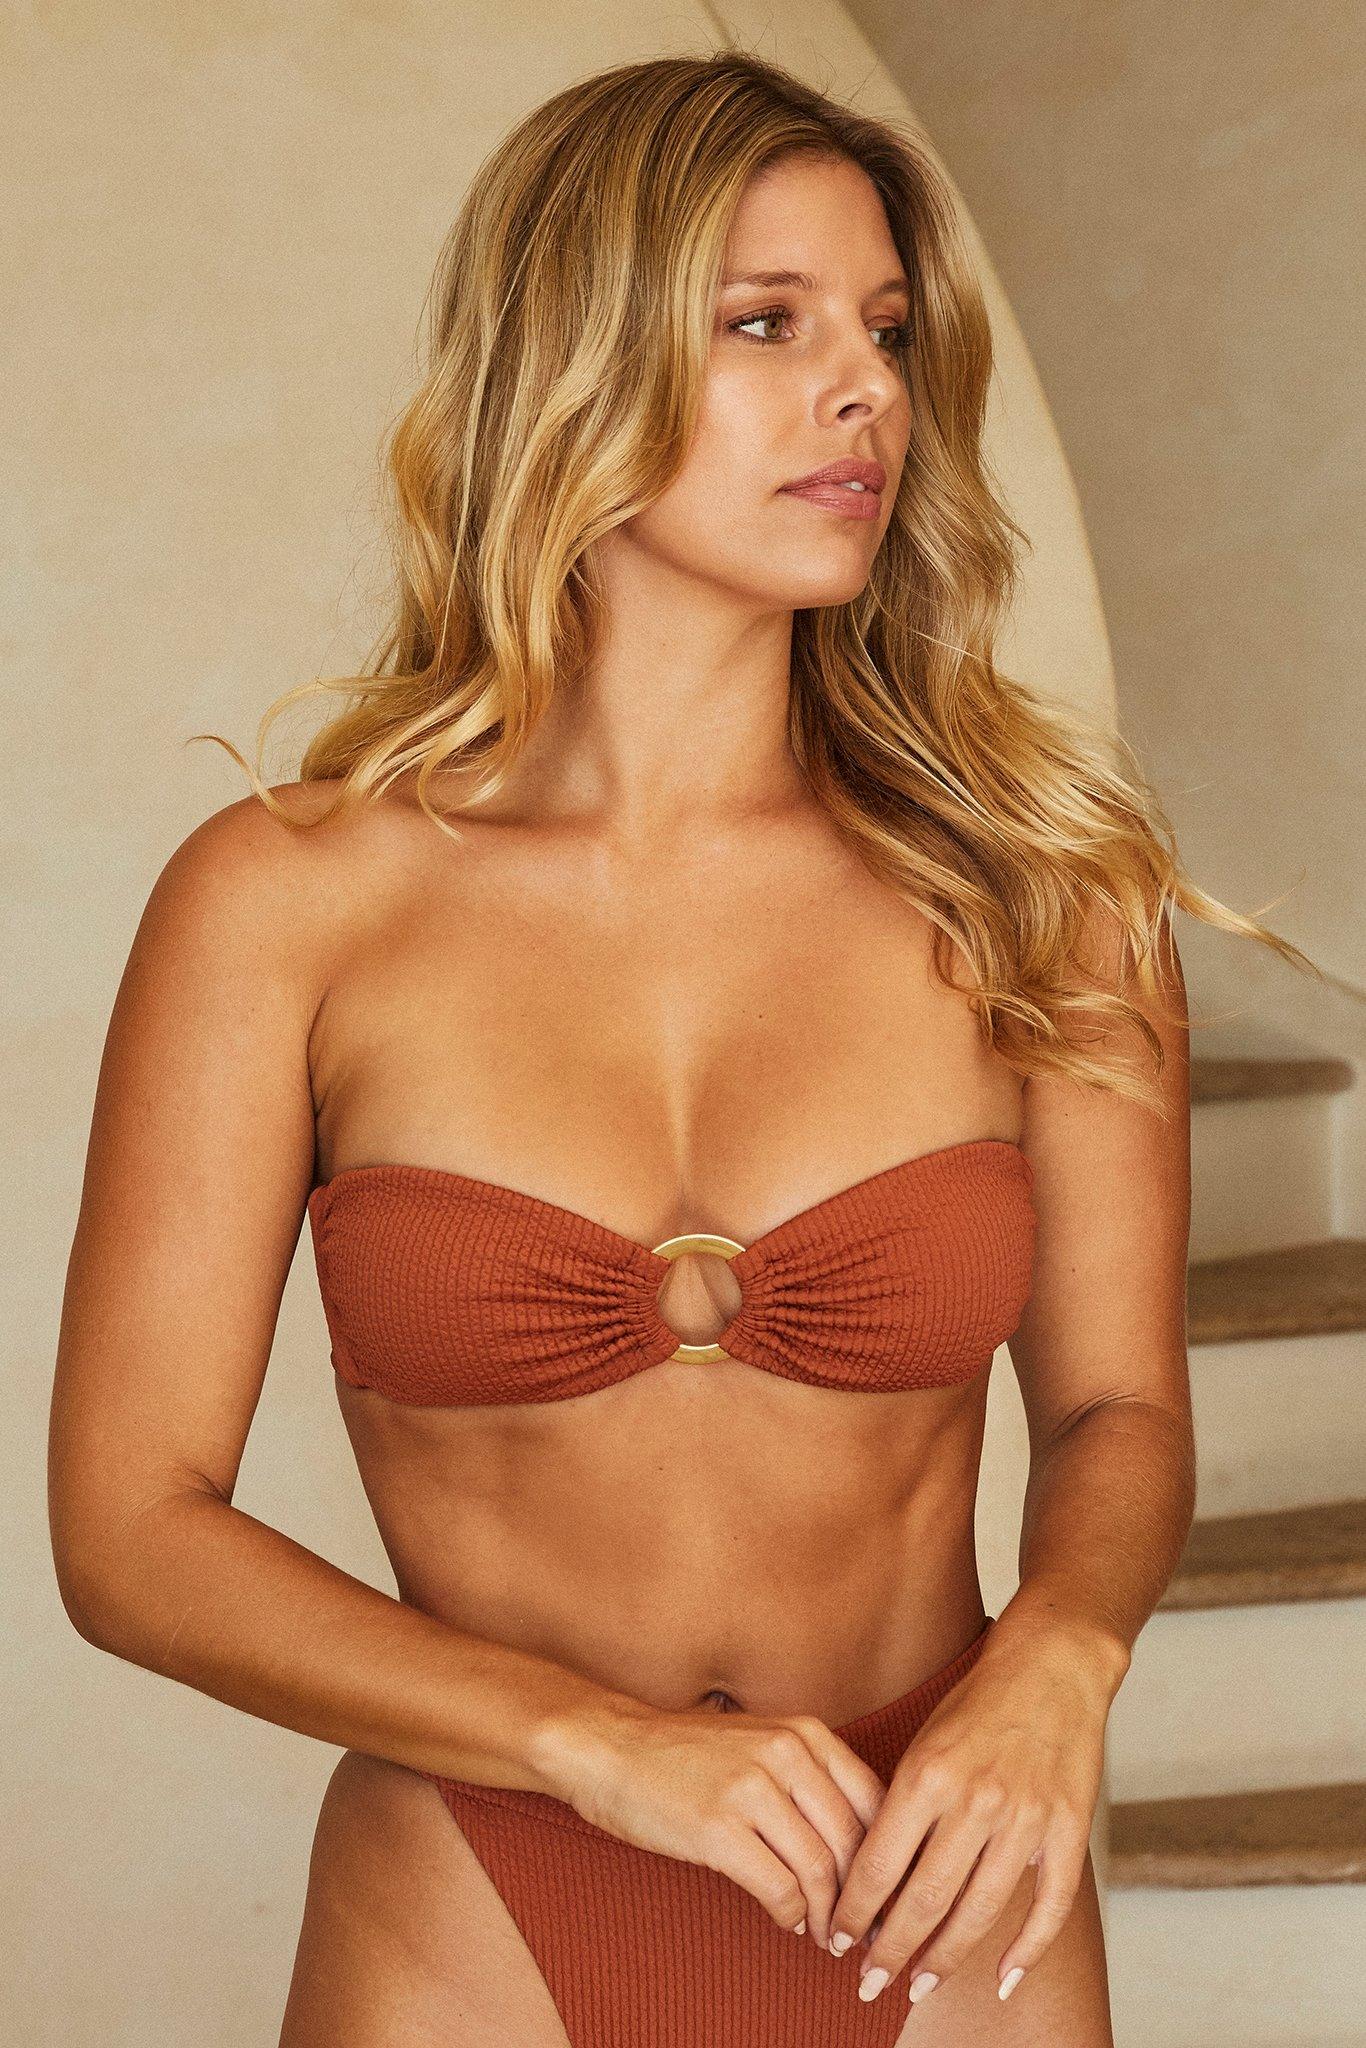 Costa Rica Top by Monday-Swimwear, available on mondayswimwear.com for $84 Natasha Oakley Top Exact Product